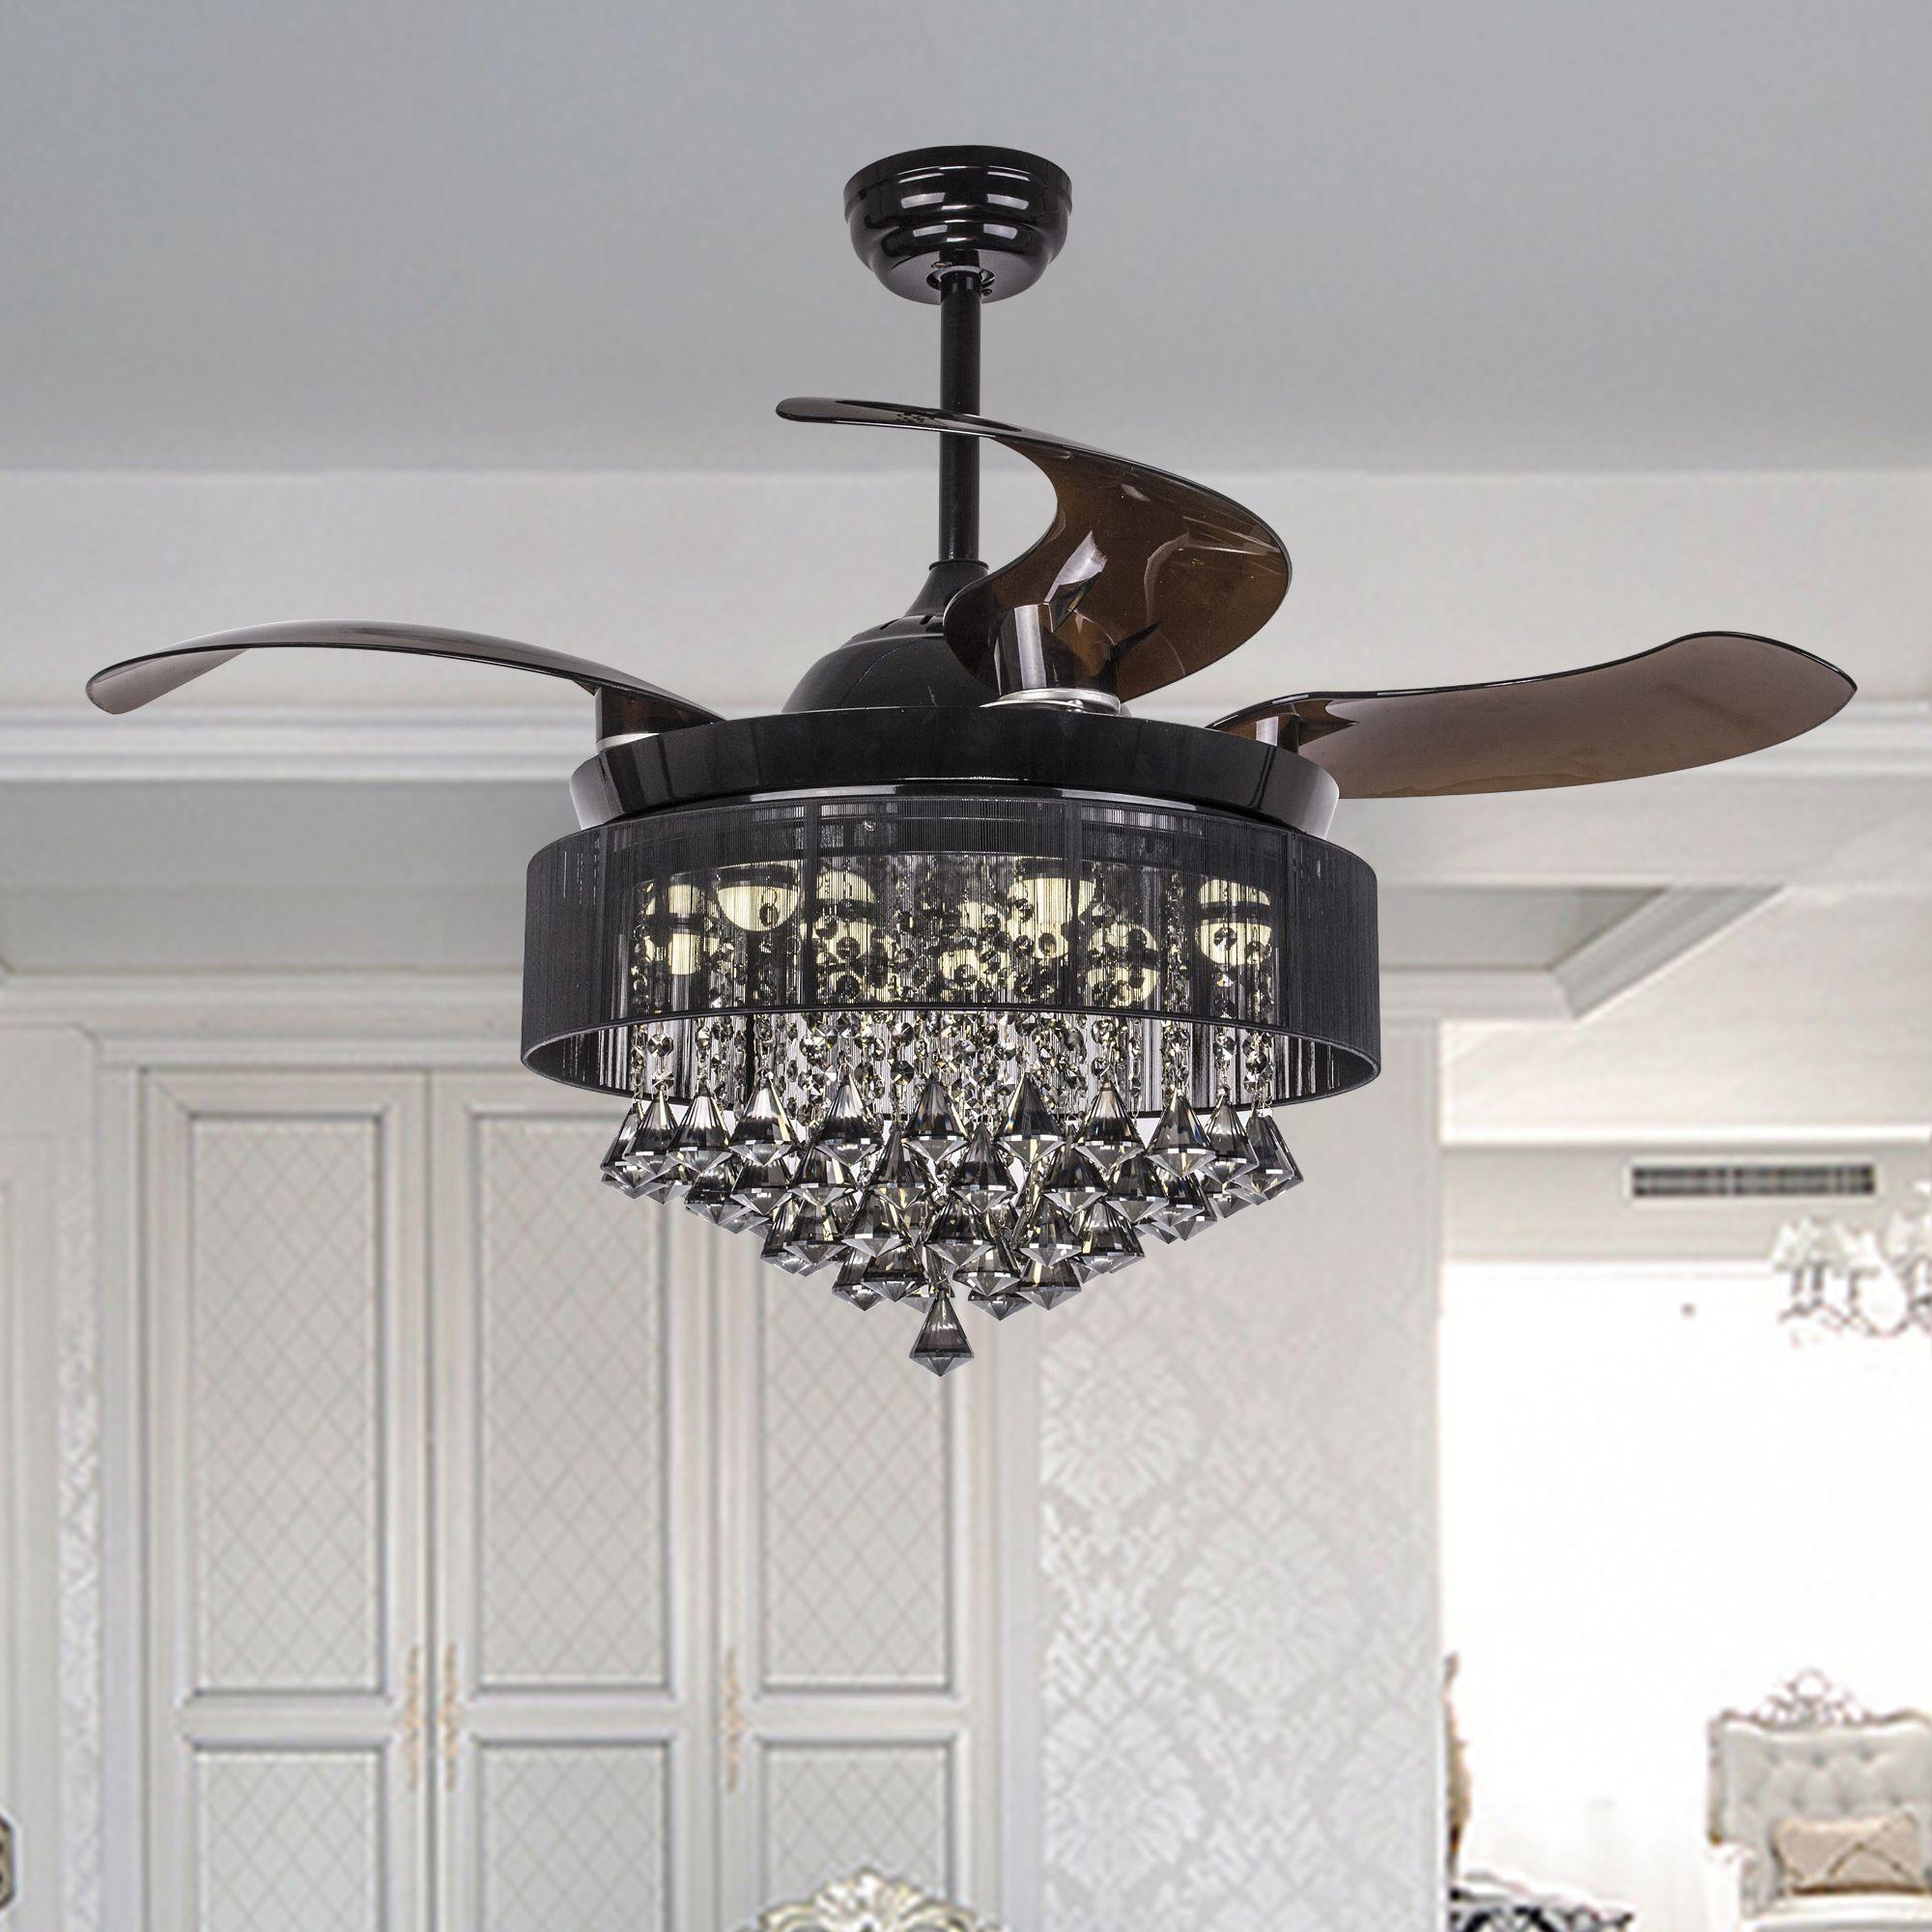 43 Birchley 4 Blade Led Ceiling Fan With Remote Black Chandelier Ceiling Fan Whoselamp